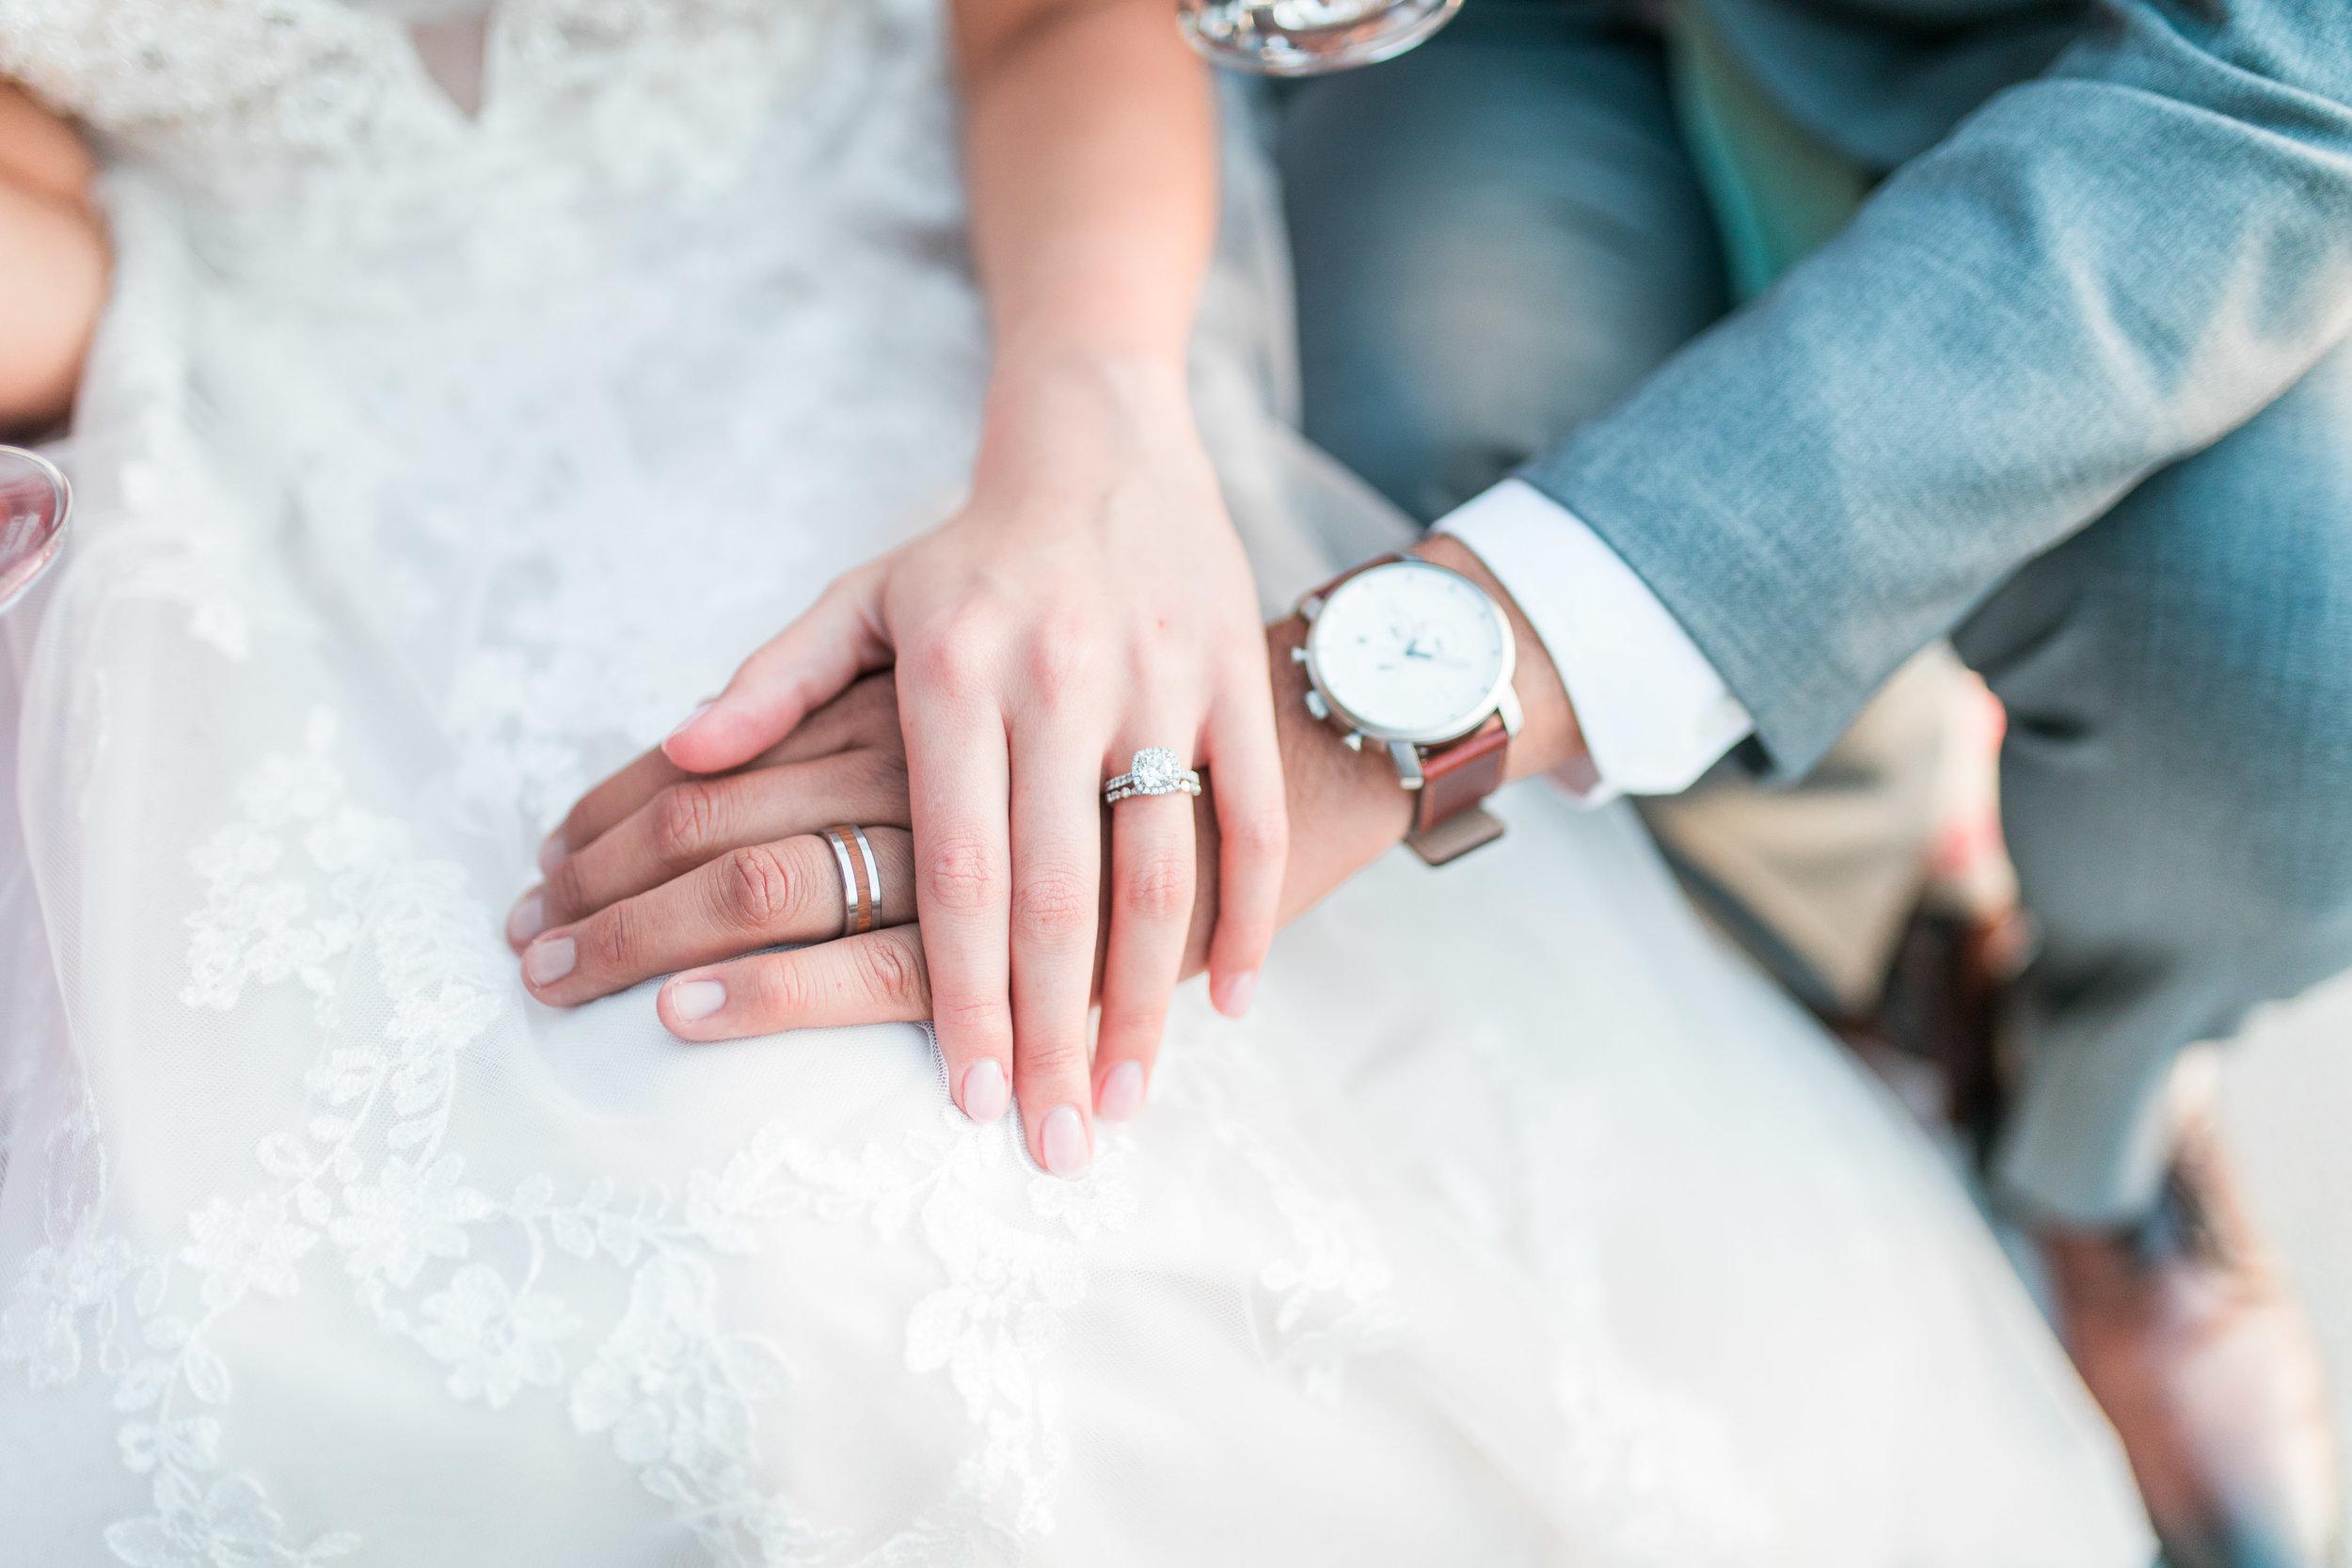 Tess-Jesse-Wedding-SP-by-JBJ-Pictures-20.jpg